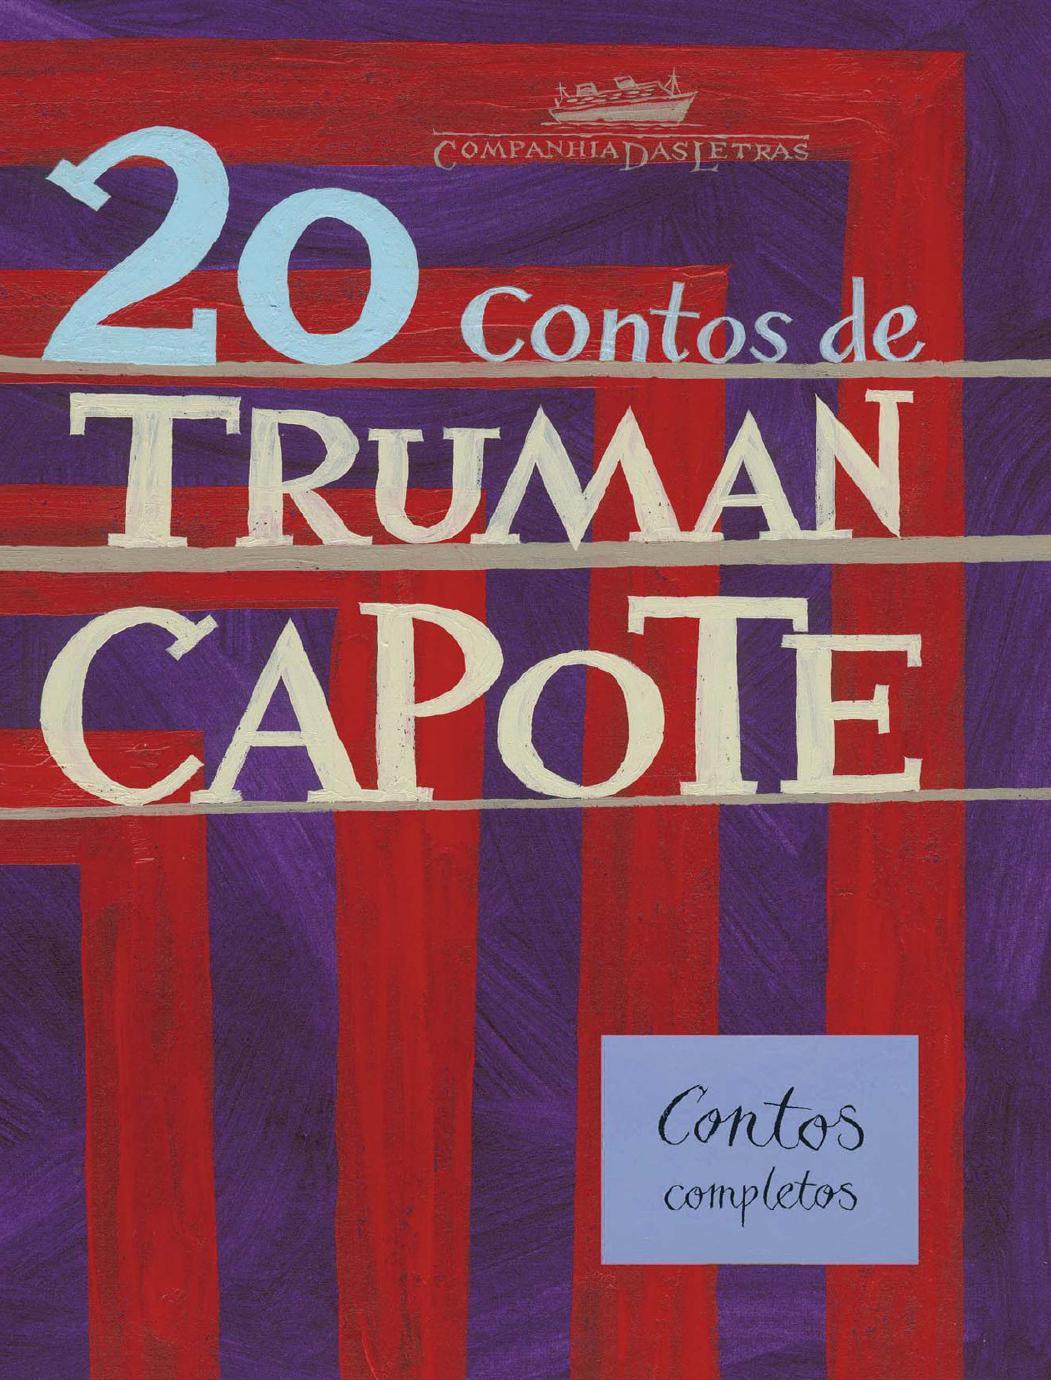 20 contos de truman capote truman capote by elentatiane - issuu c009e65503a